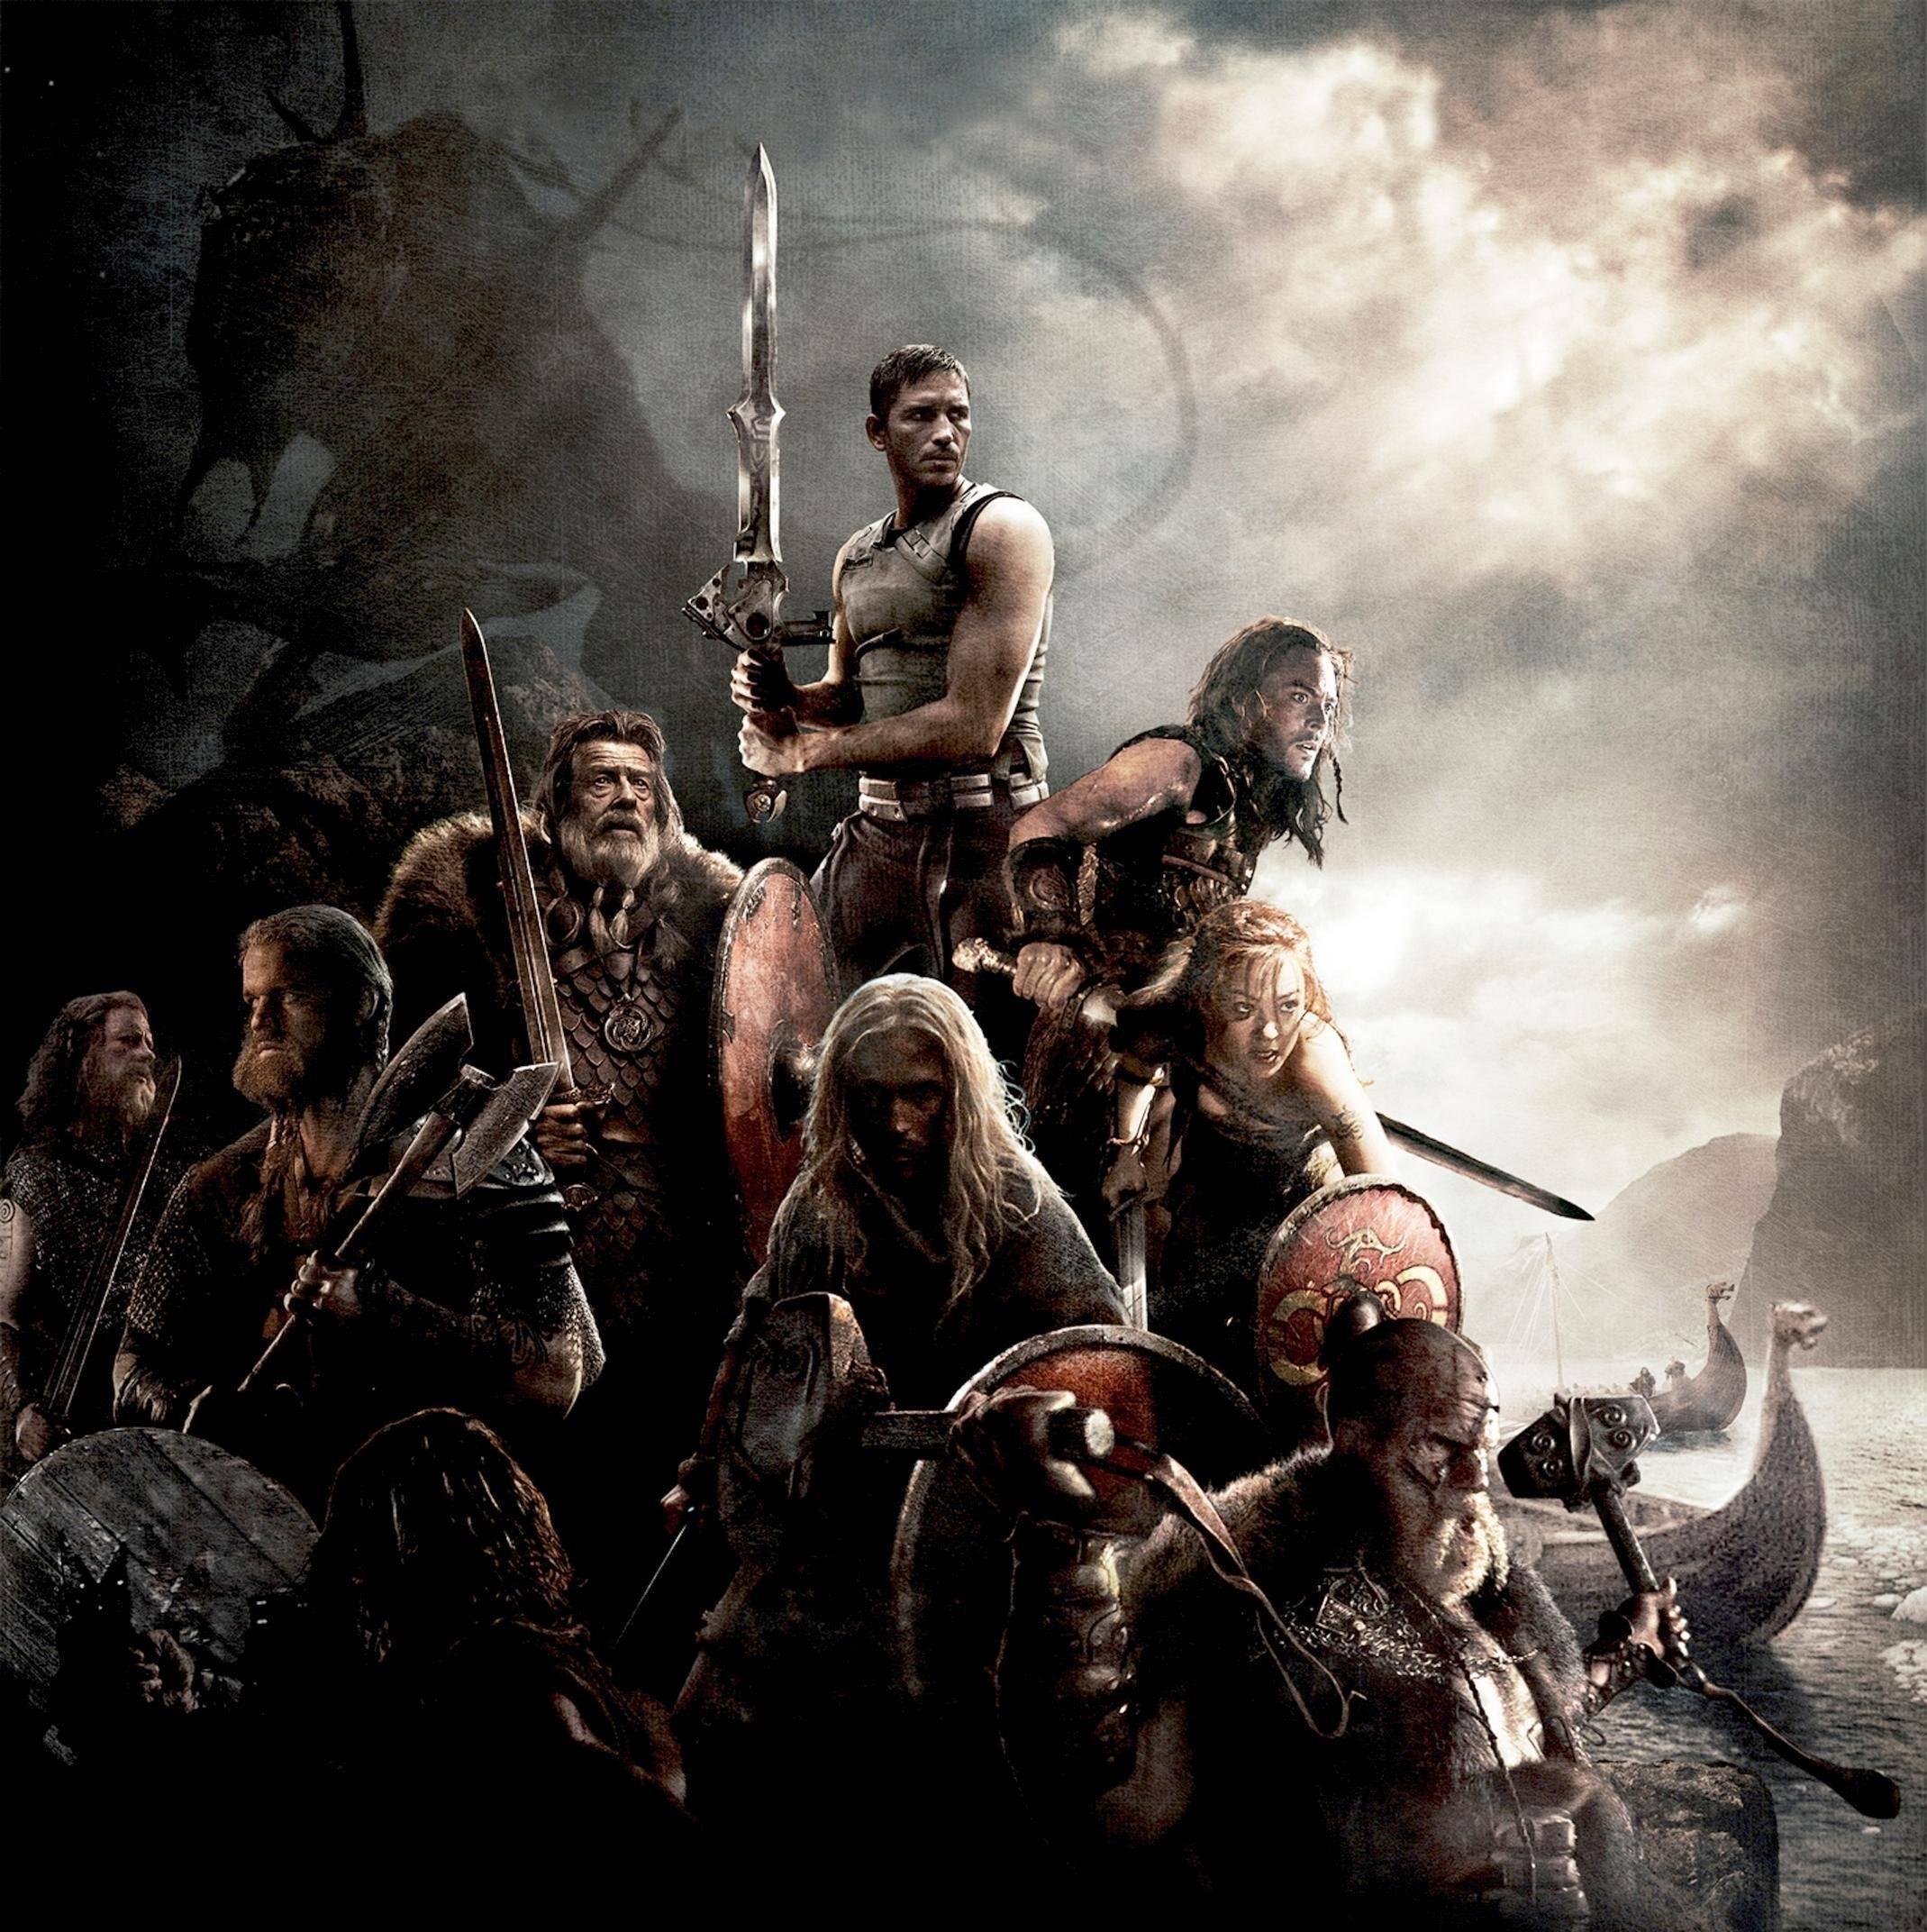 Viking Wallpaper Images